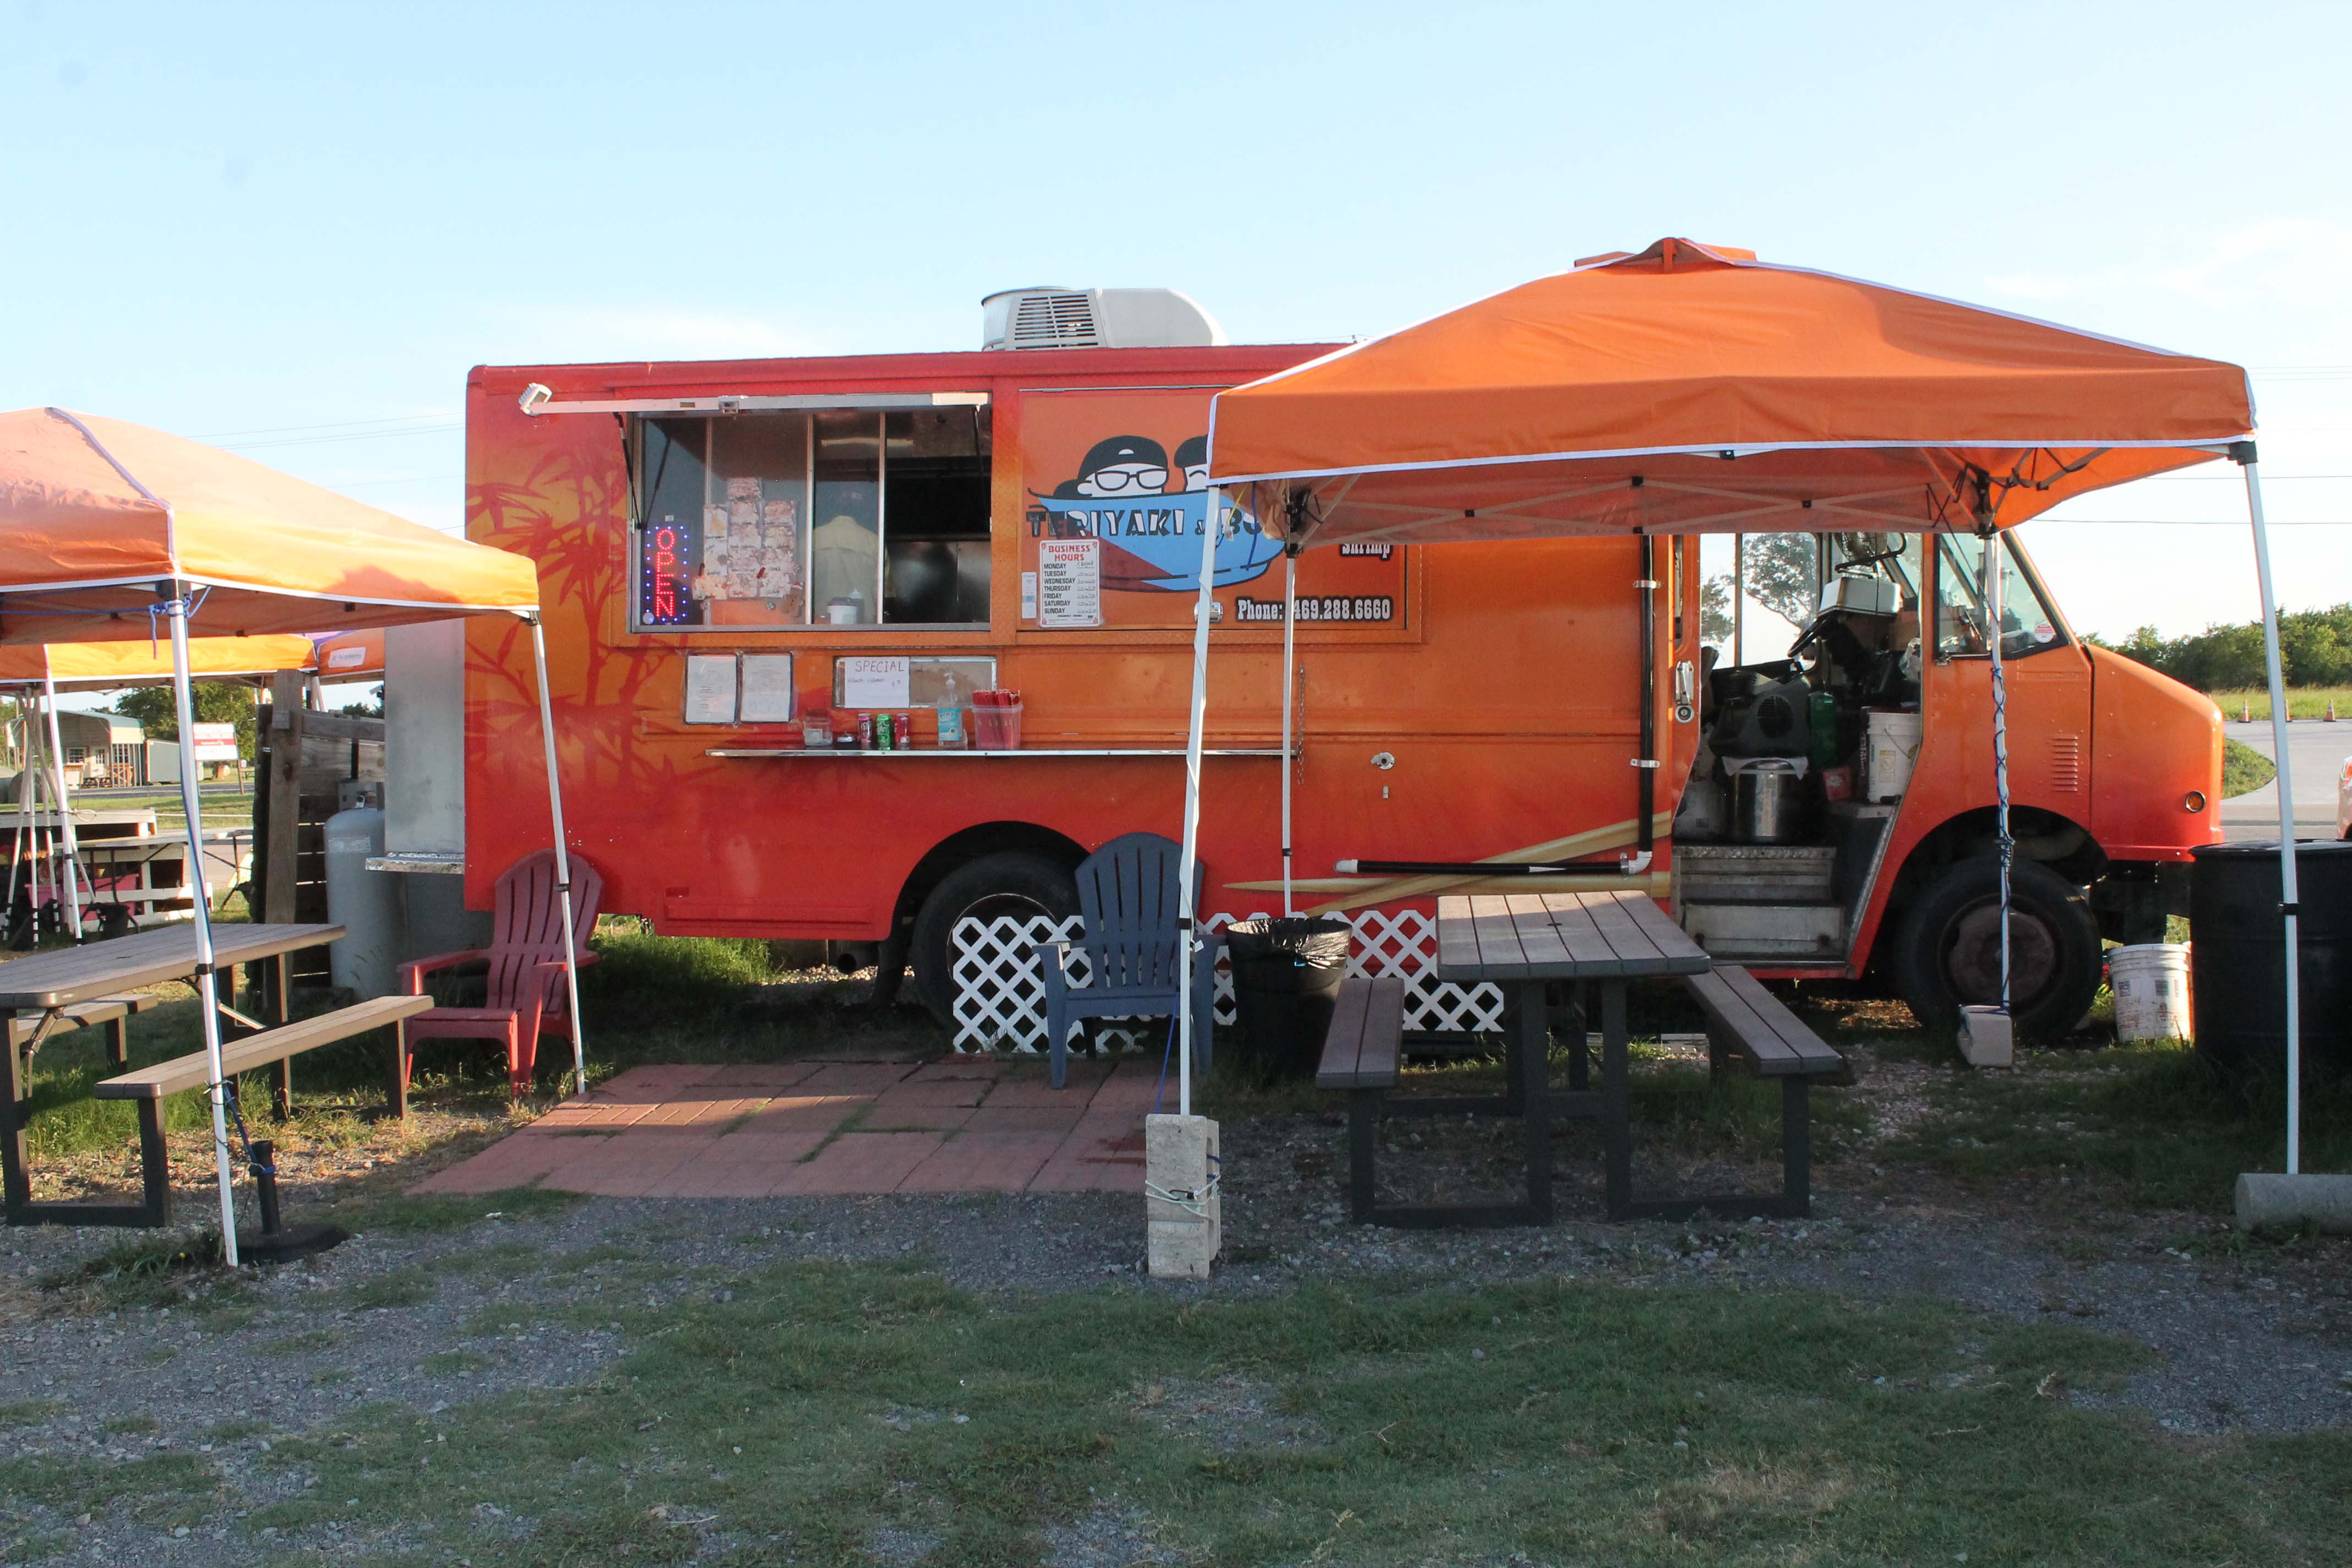 Food trucks cater to Princeton